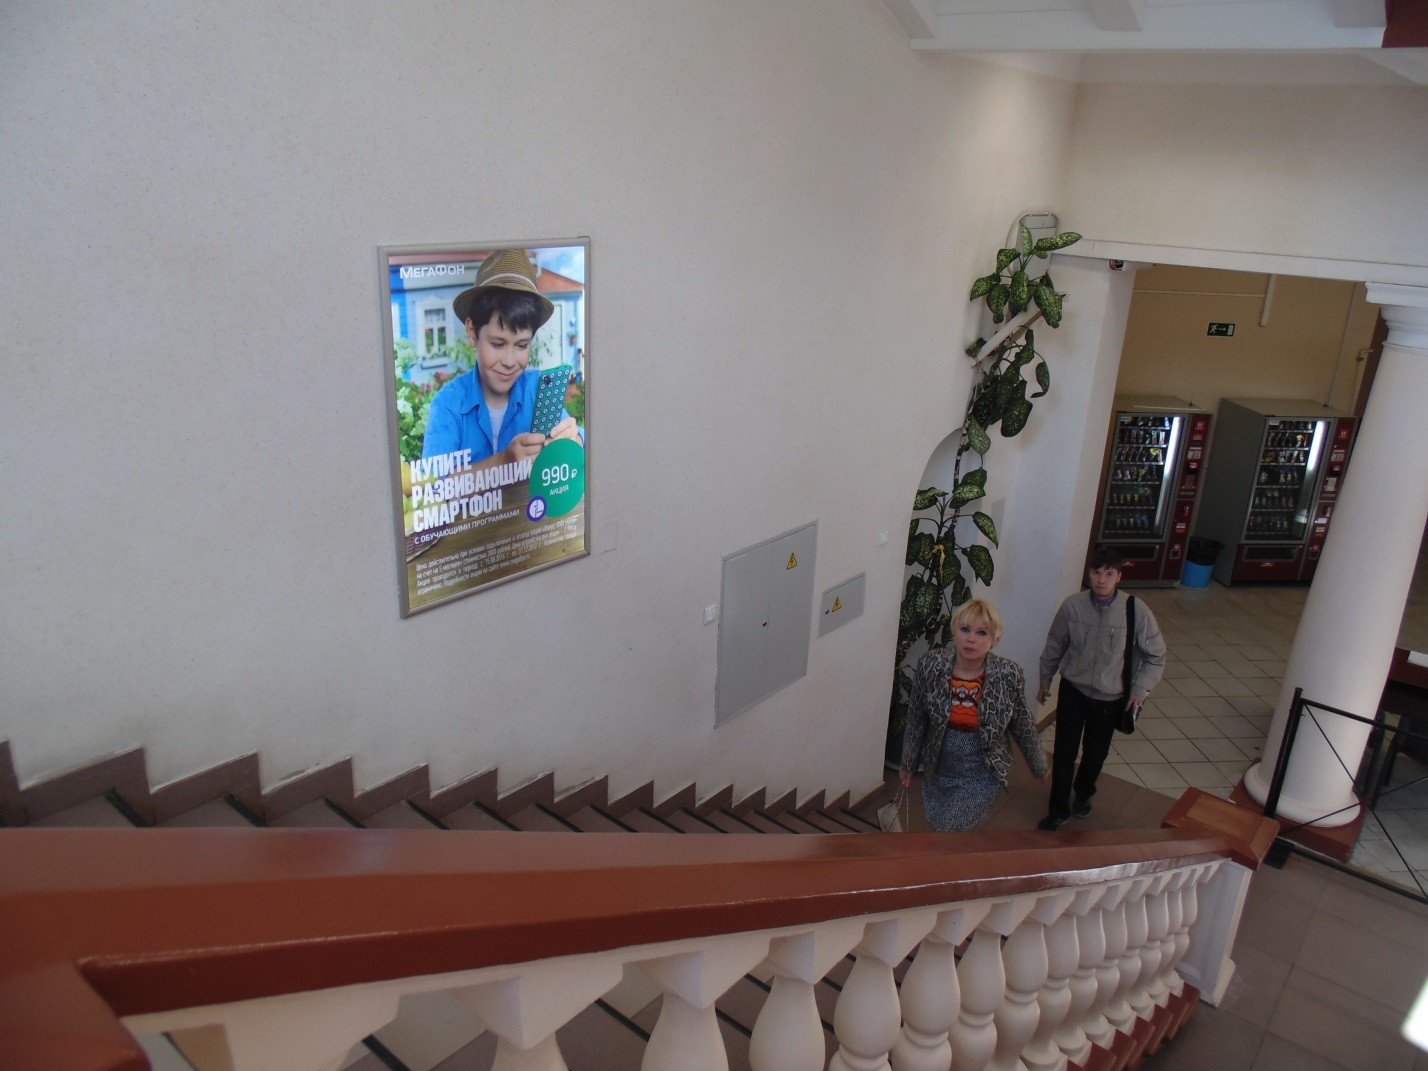 Мегафон в Екатеринбурге (УрФУ)